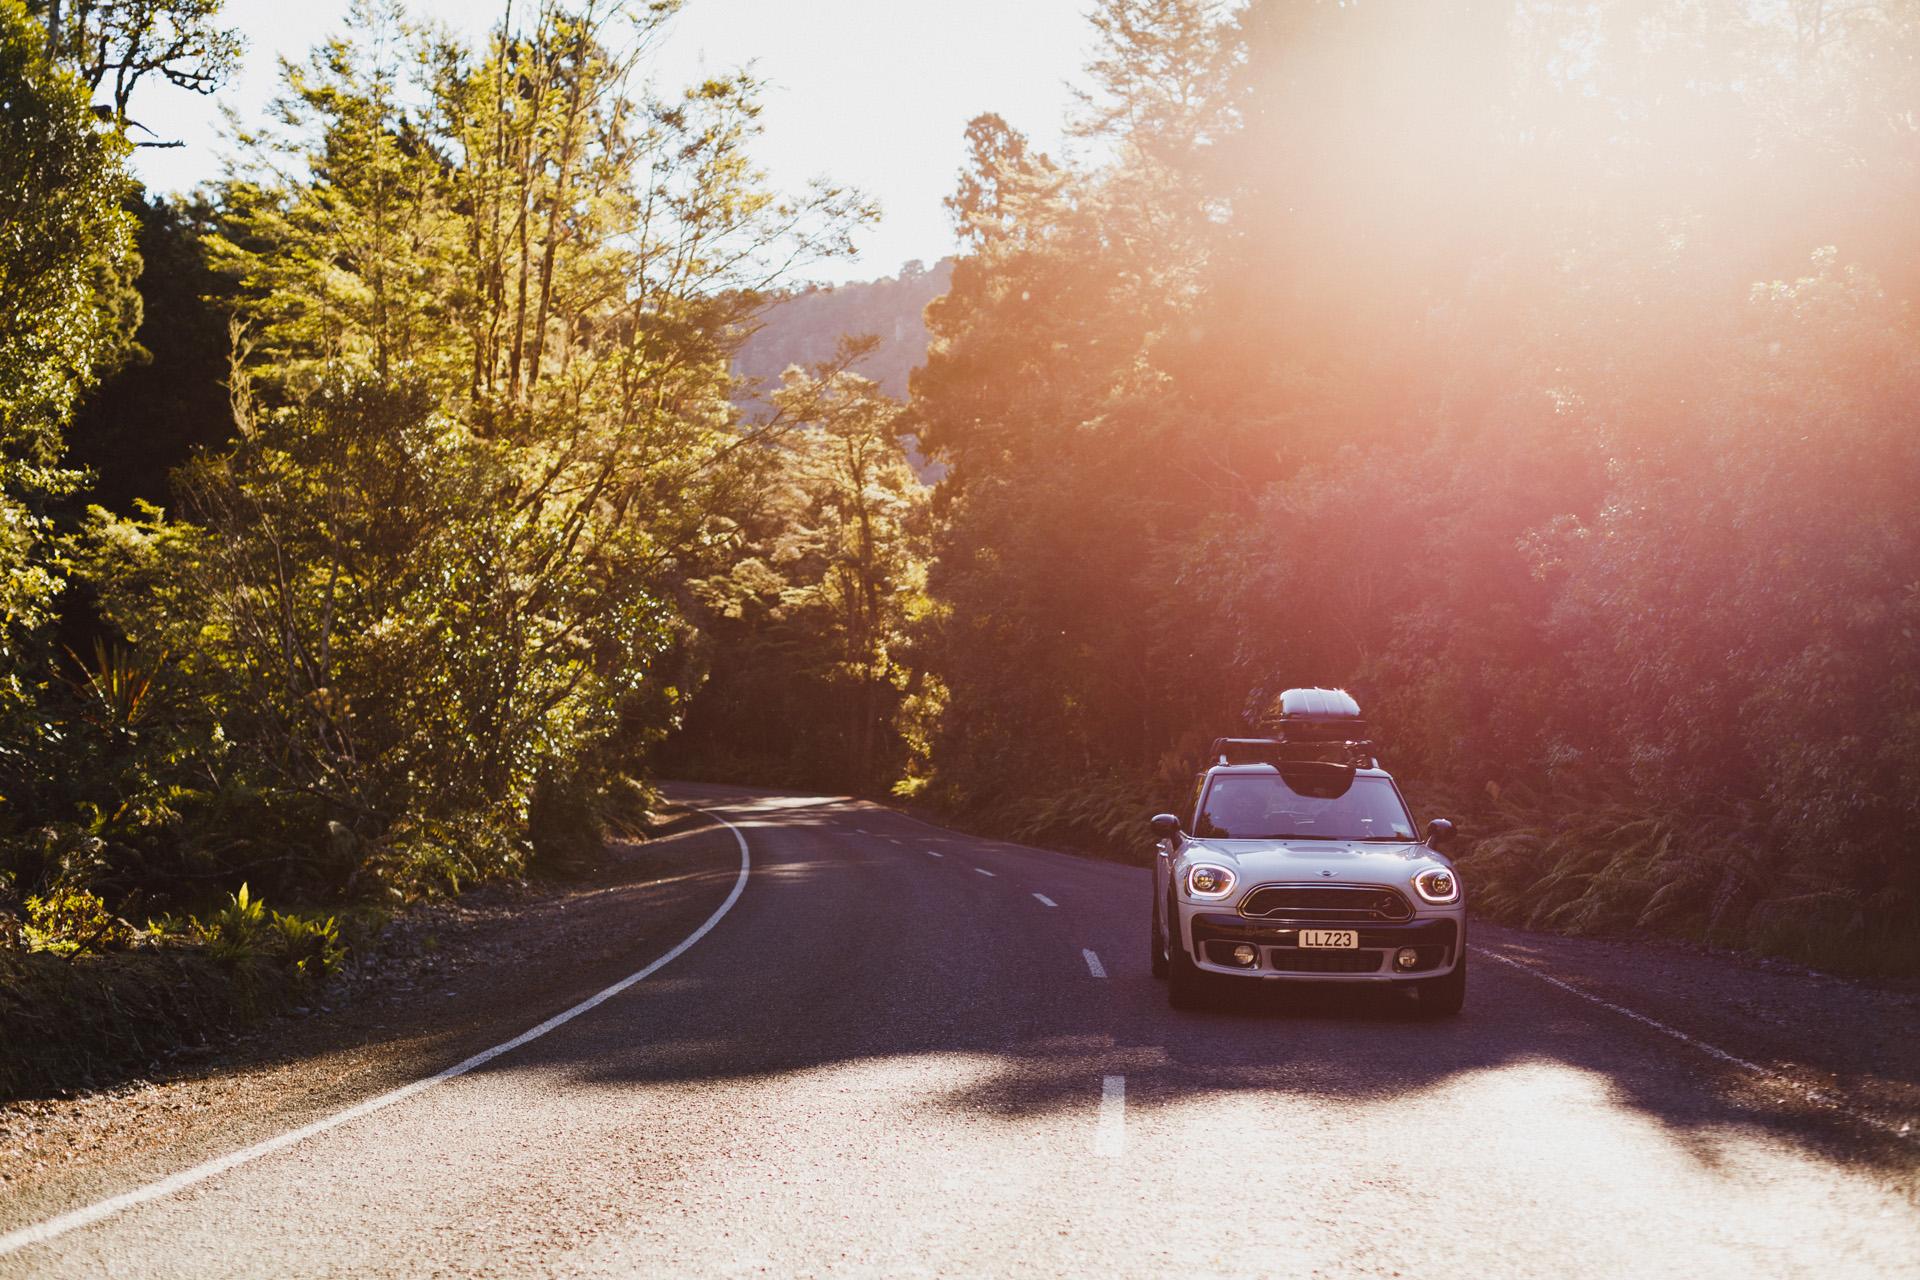 New Zealand Automotive Car Photography_10.jpg